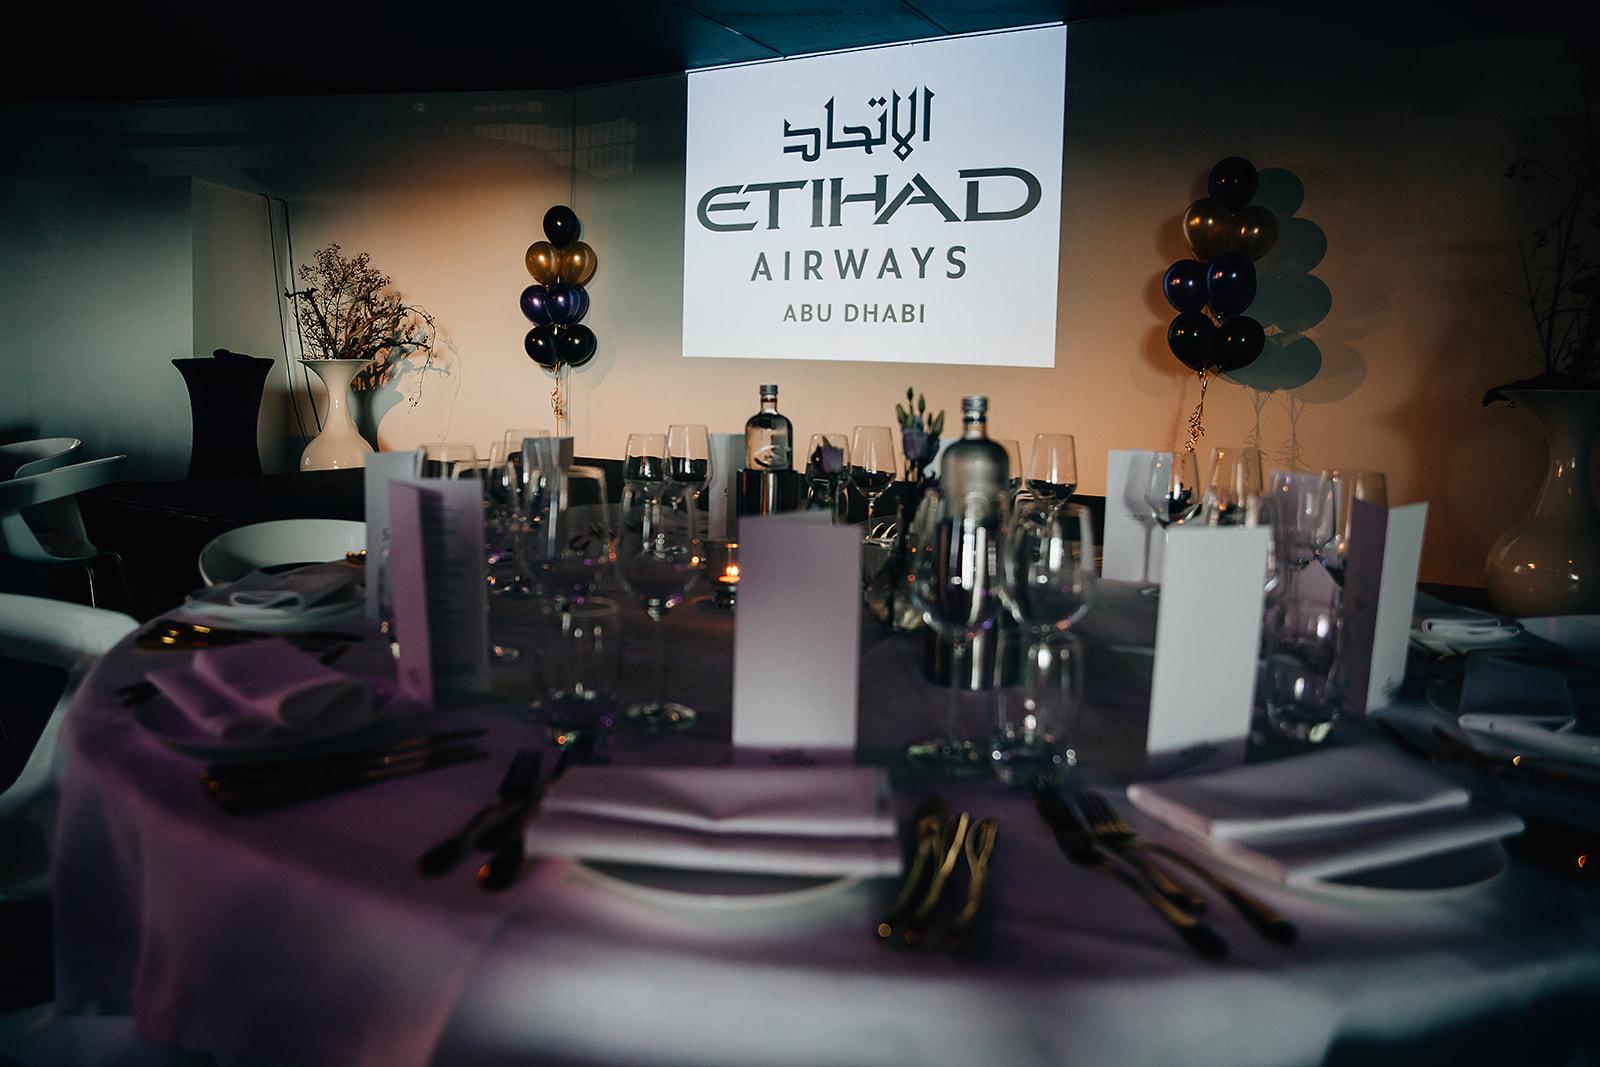 5 jaar Etihad Airways in Nederland